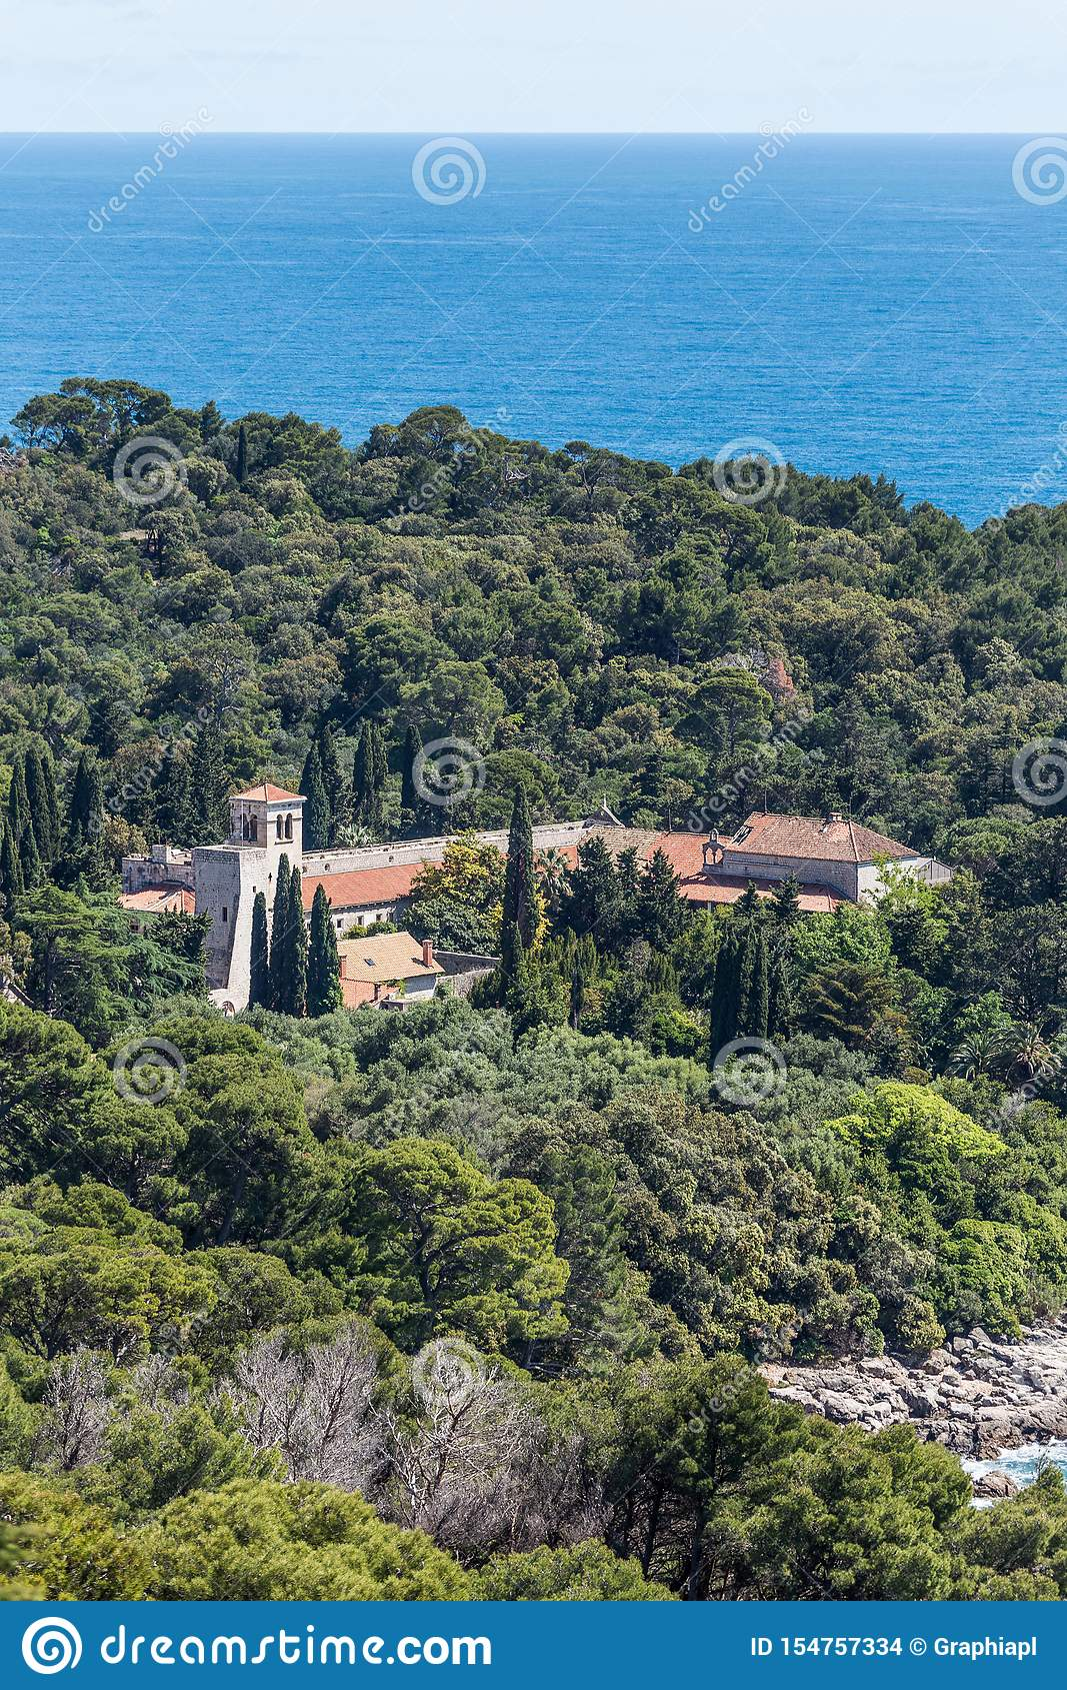 5. Mai 2019 Dubrovnik, Kroatien Locrum-Insel